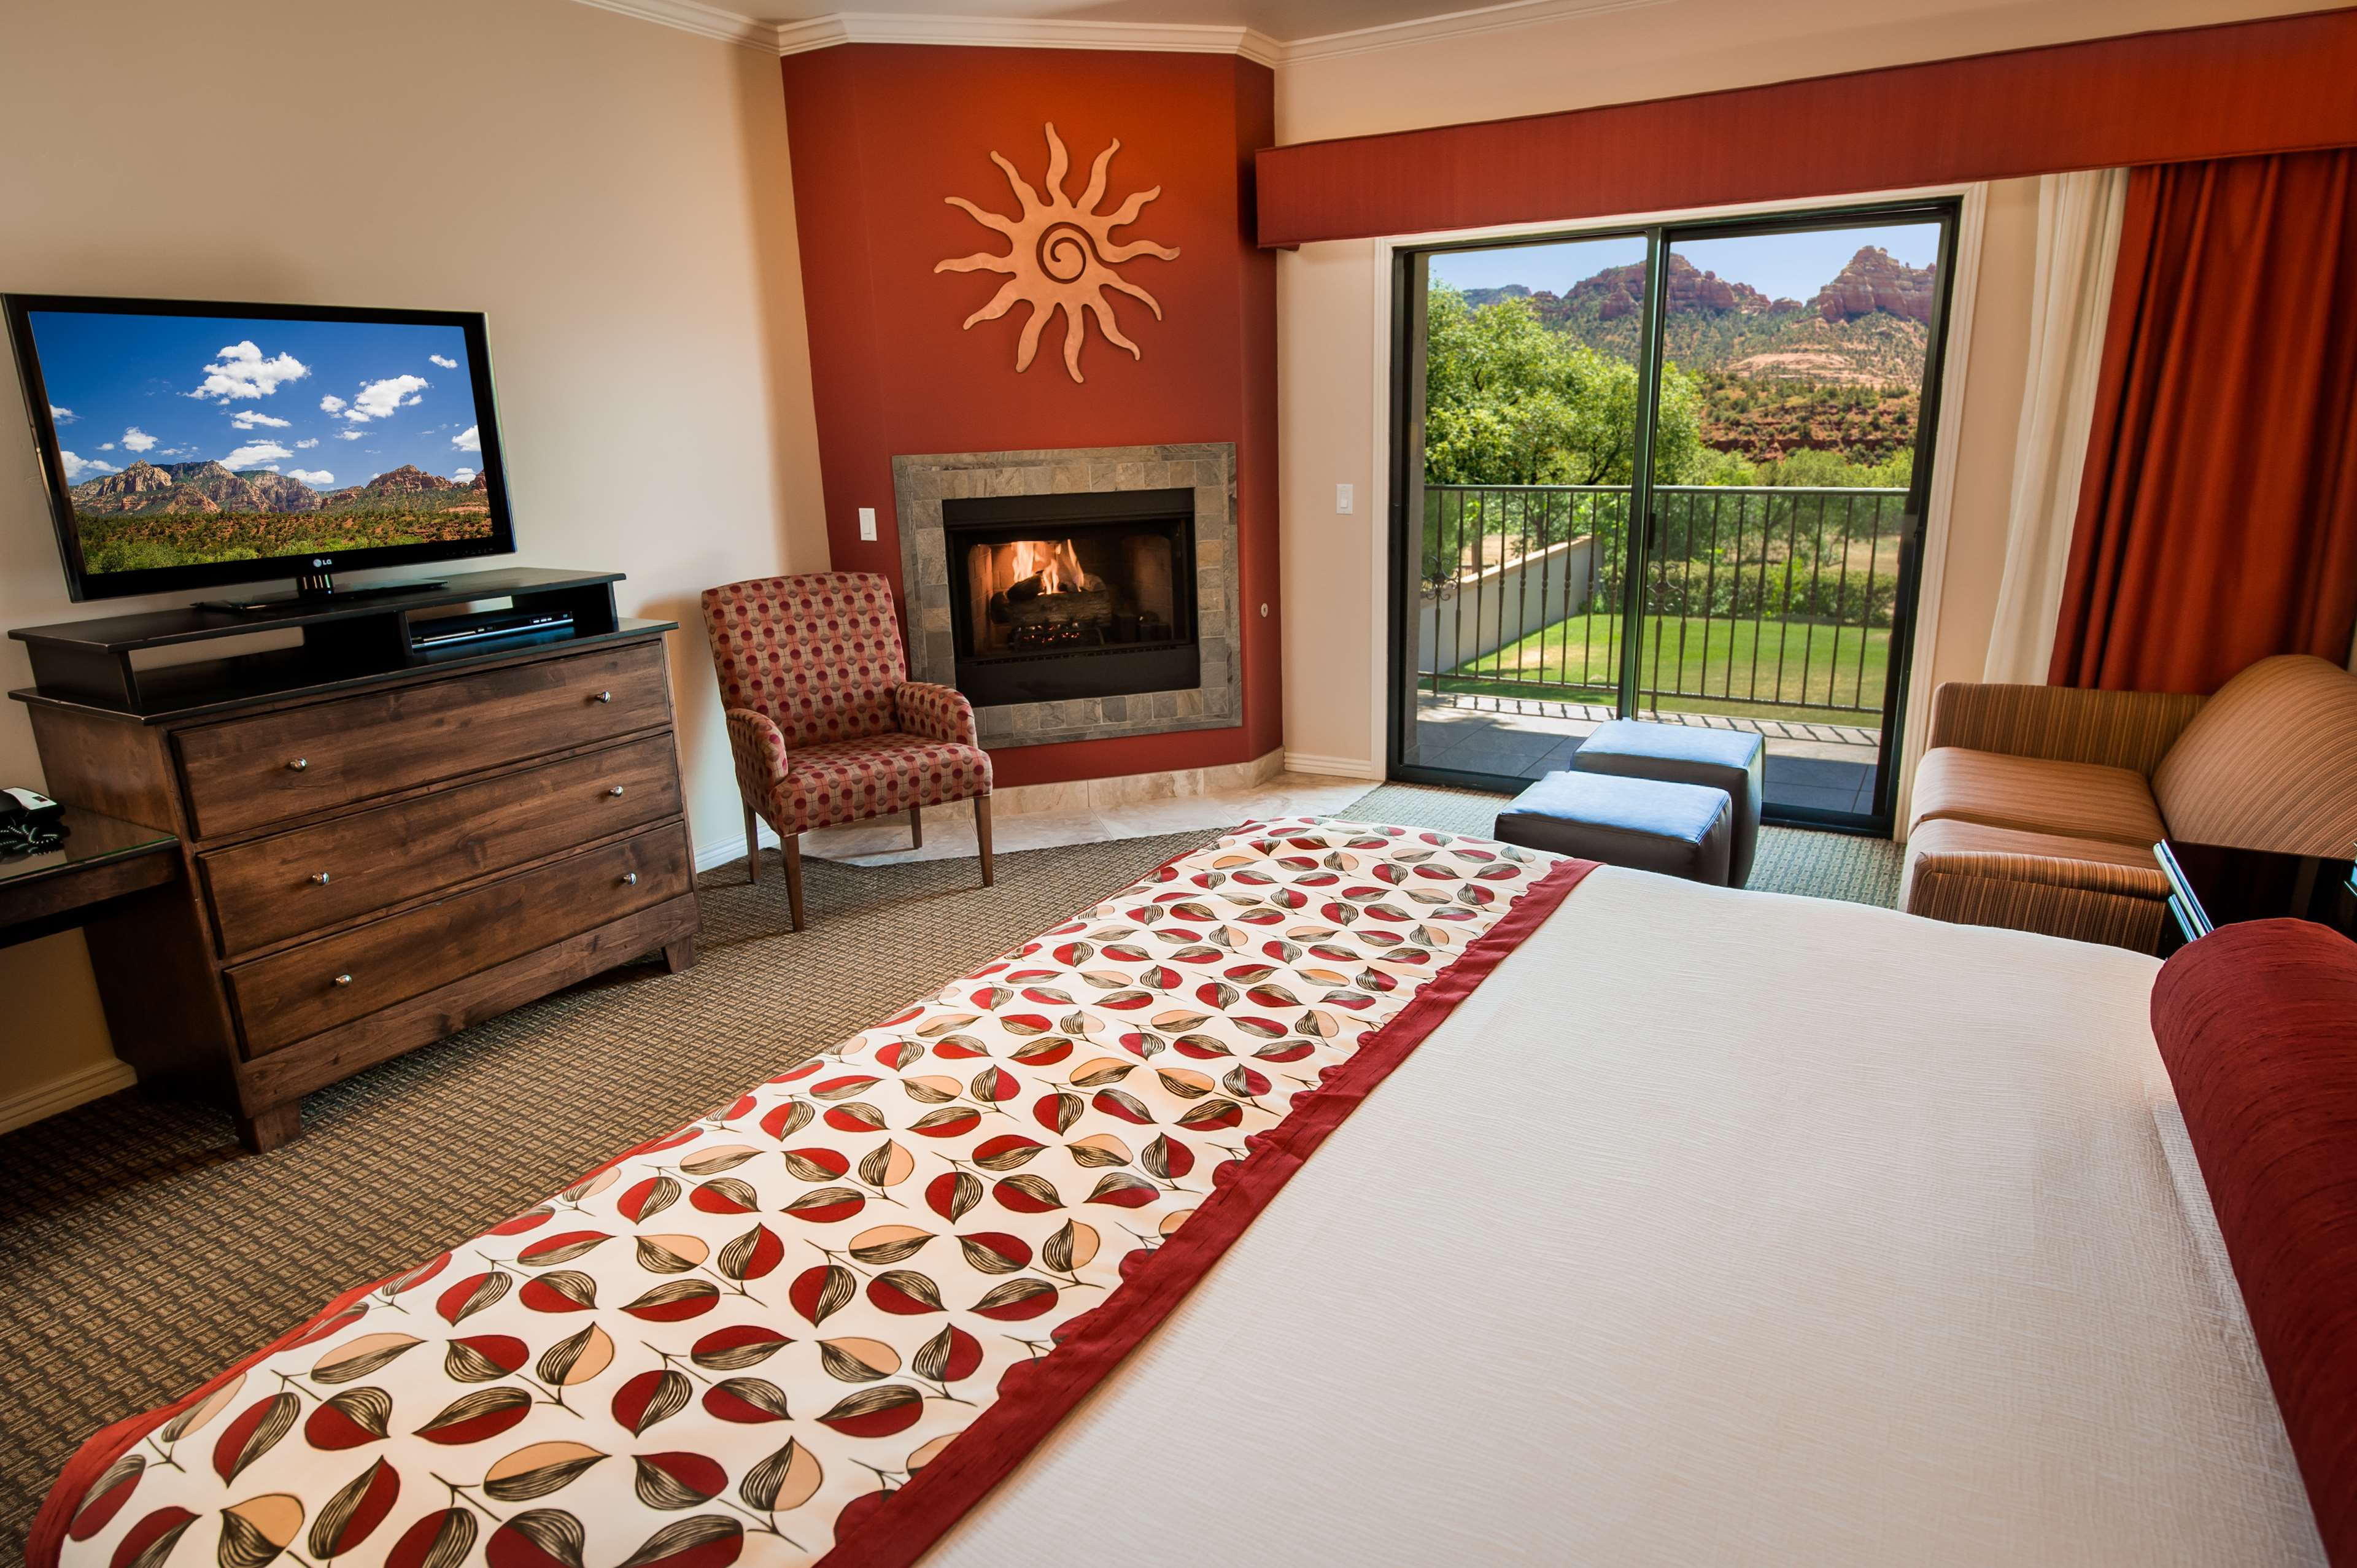 Best Western Plus Arroyo Roble Hotel & Creekside Villas image 24